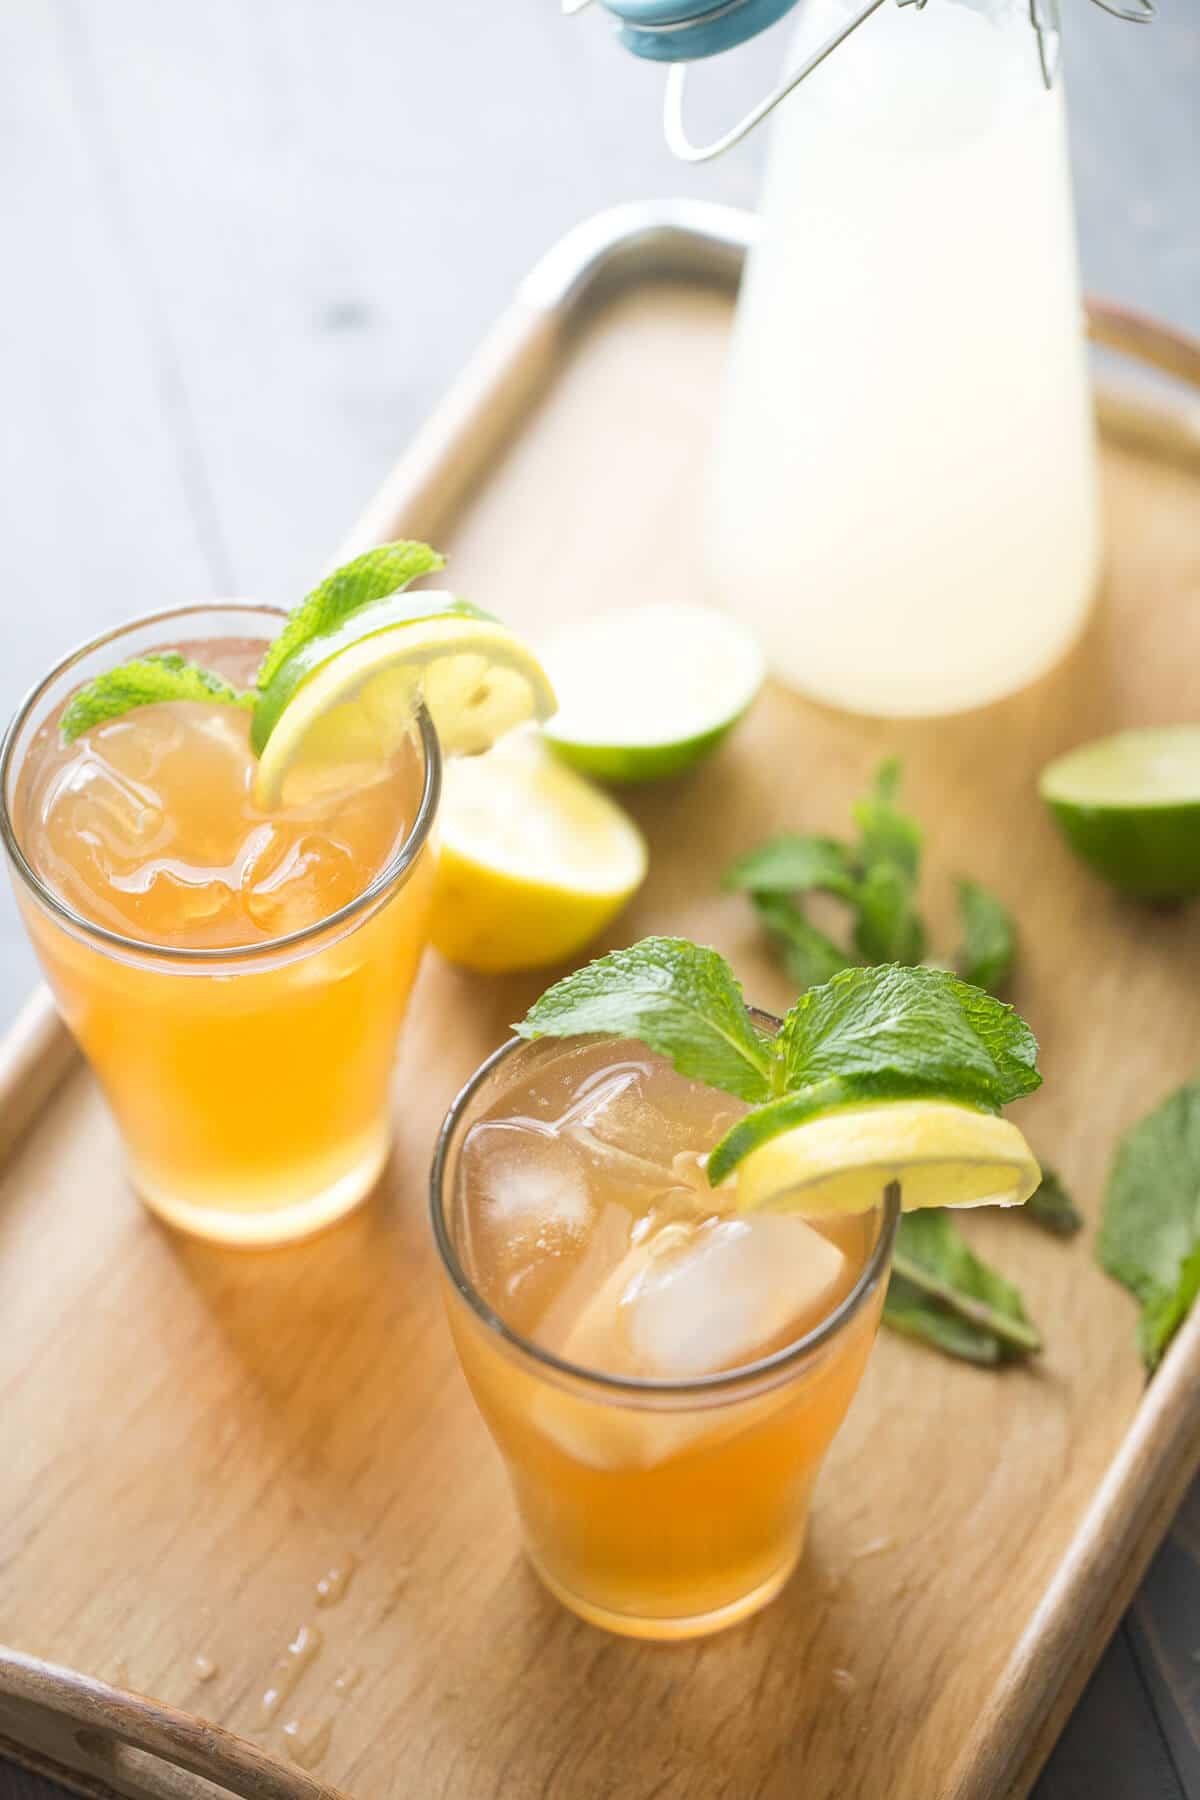 Lemonade-Moscow-Mule-Cocktail-Recipe-2.jpg